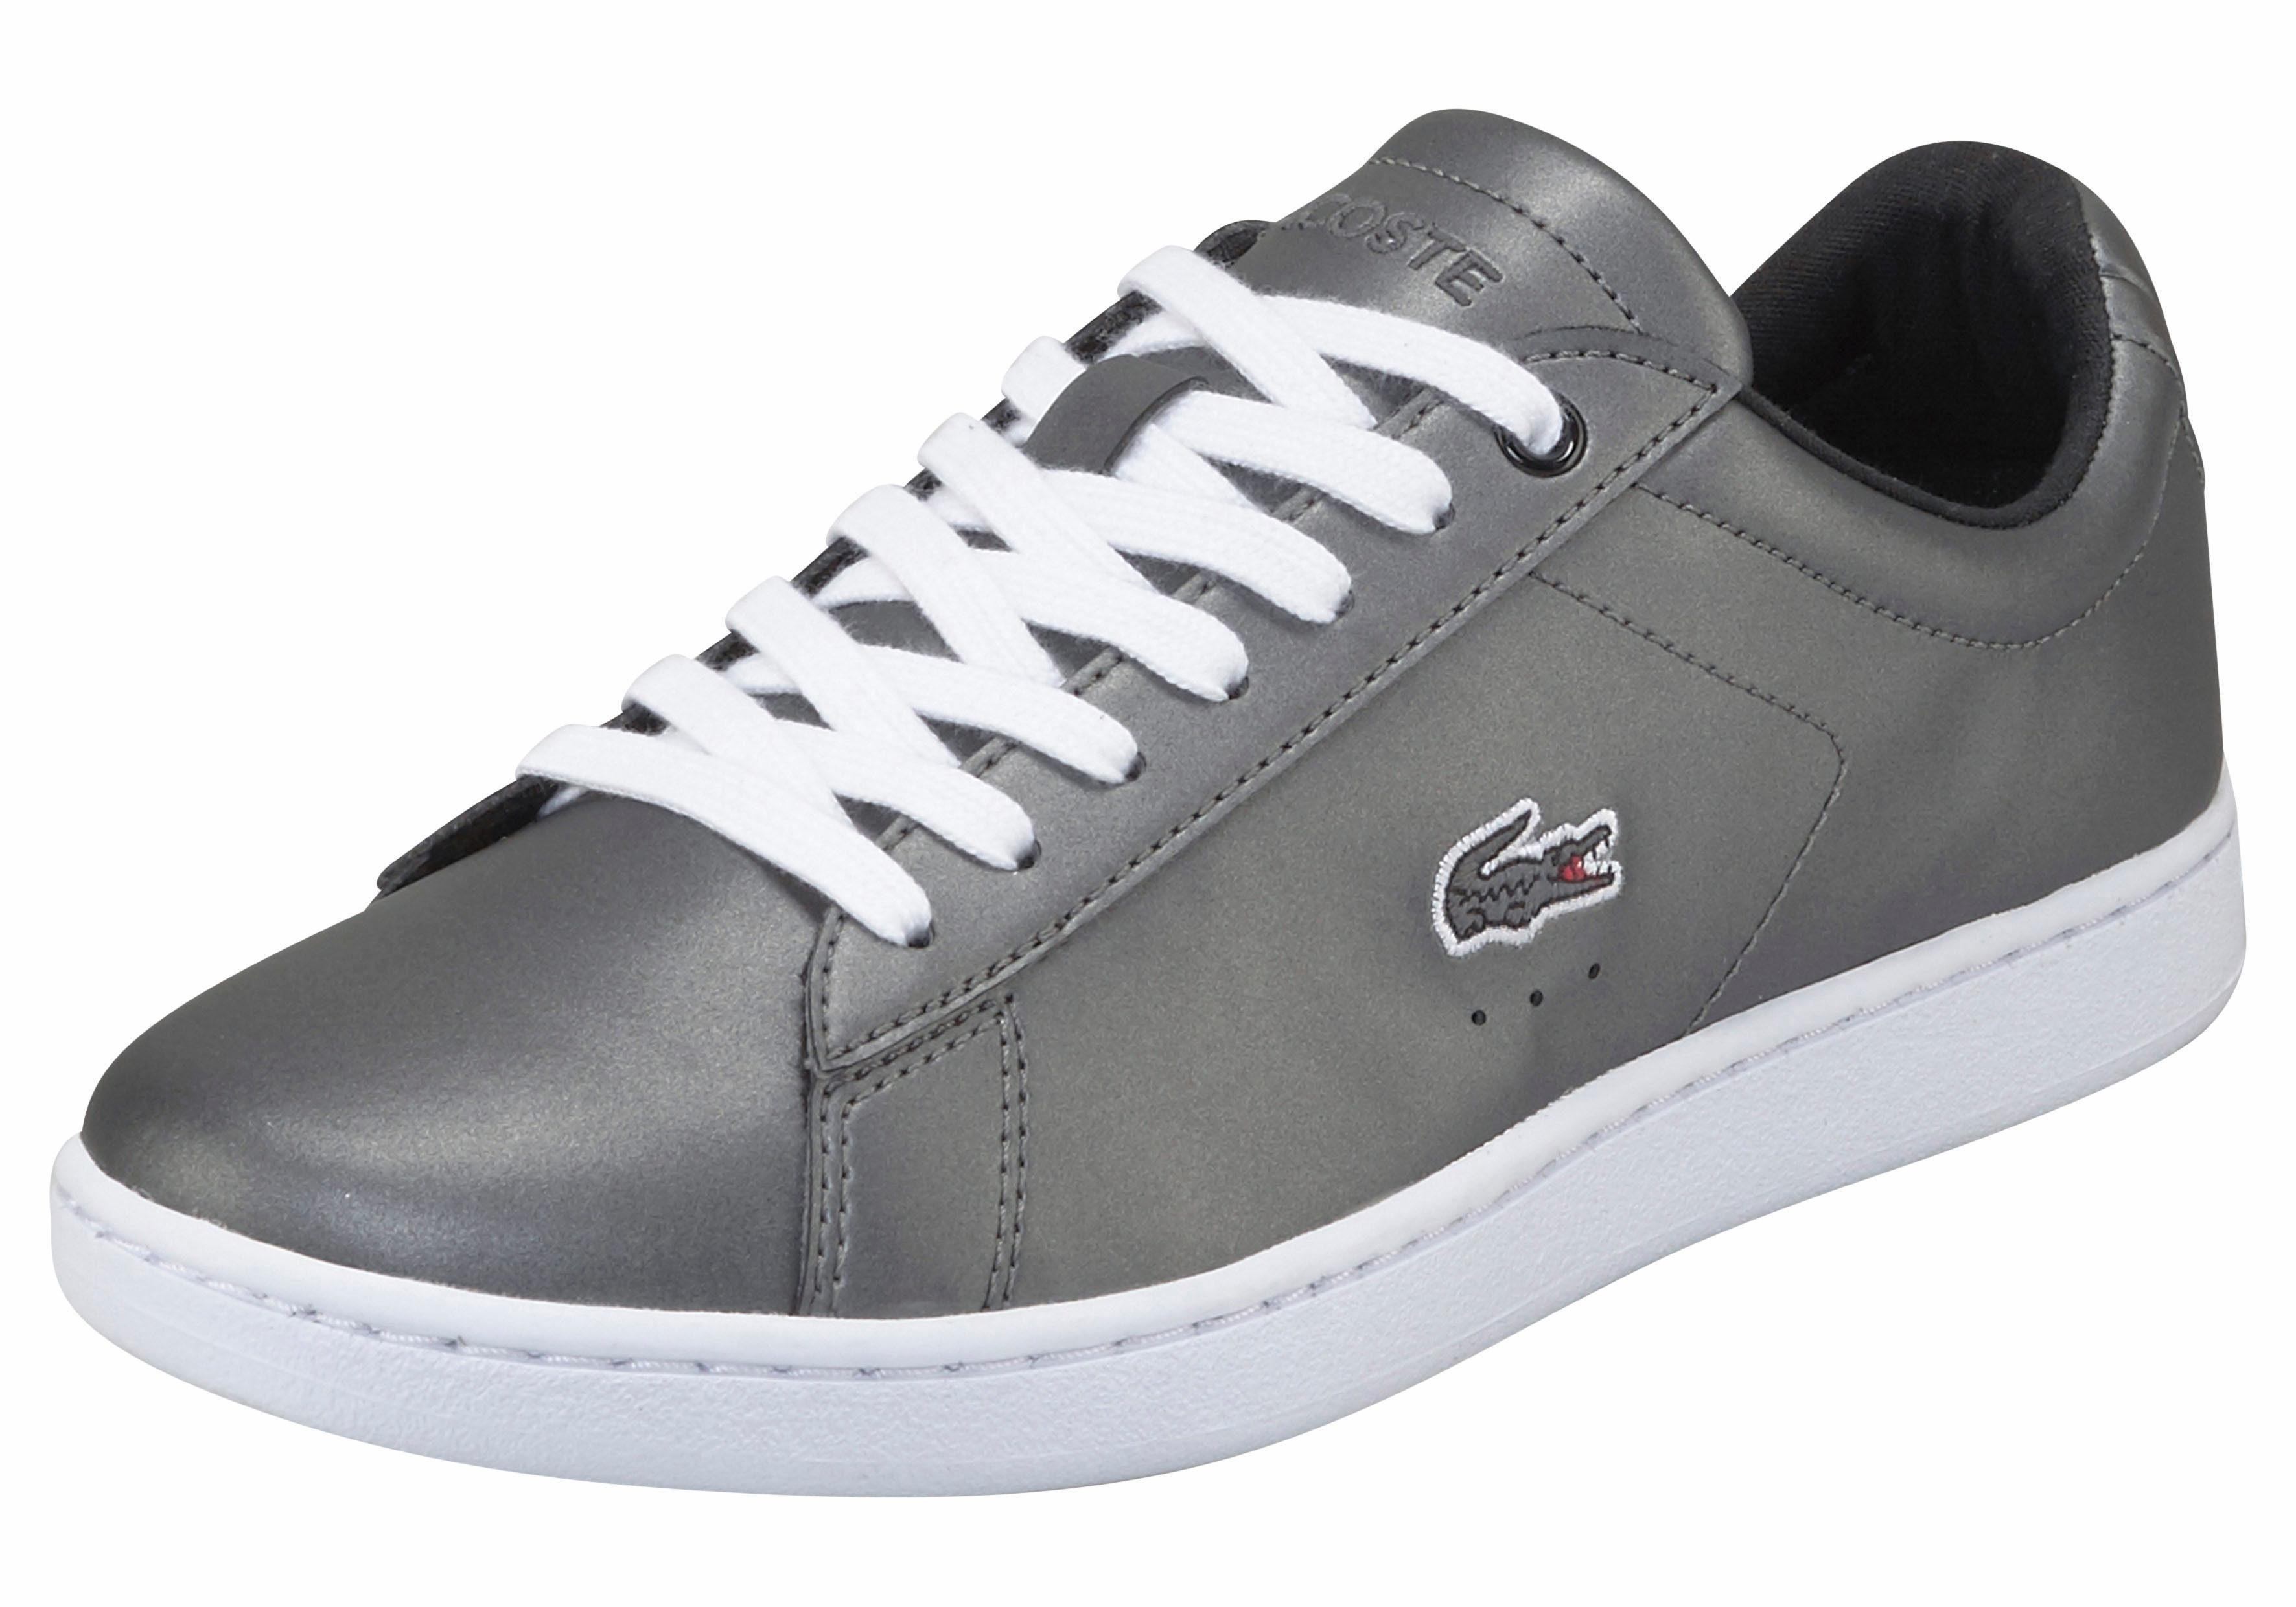 Lacoste Carnaby Evo 317 4 Sneaker online kaufen  metallicgrau